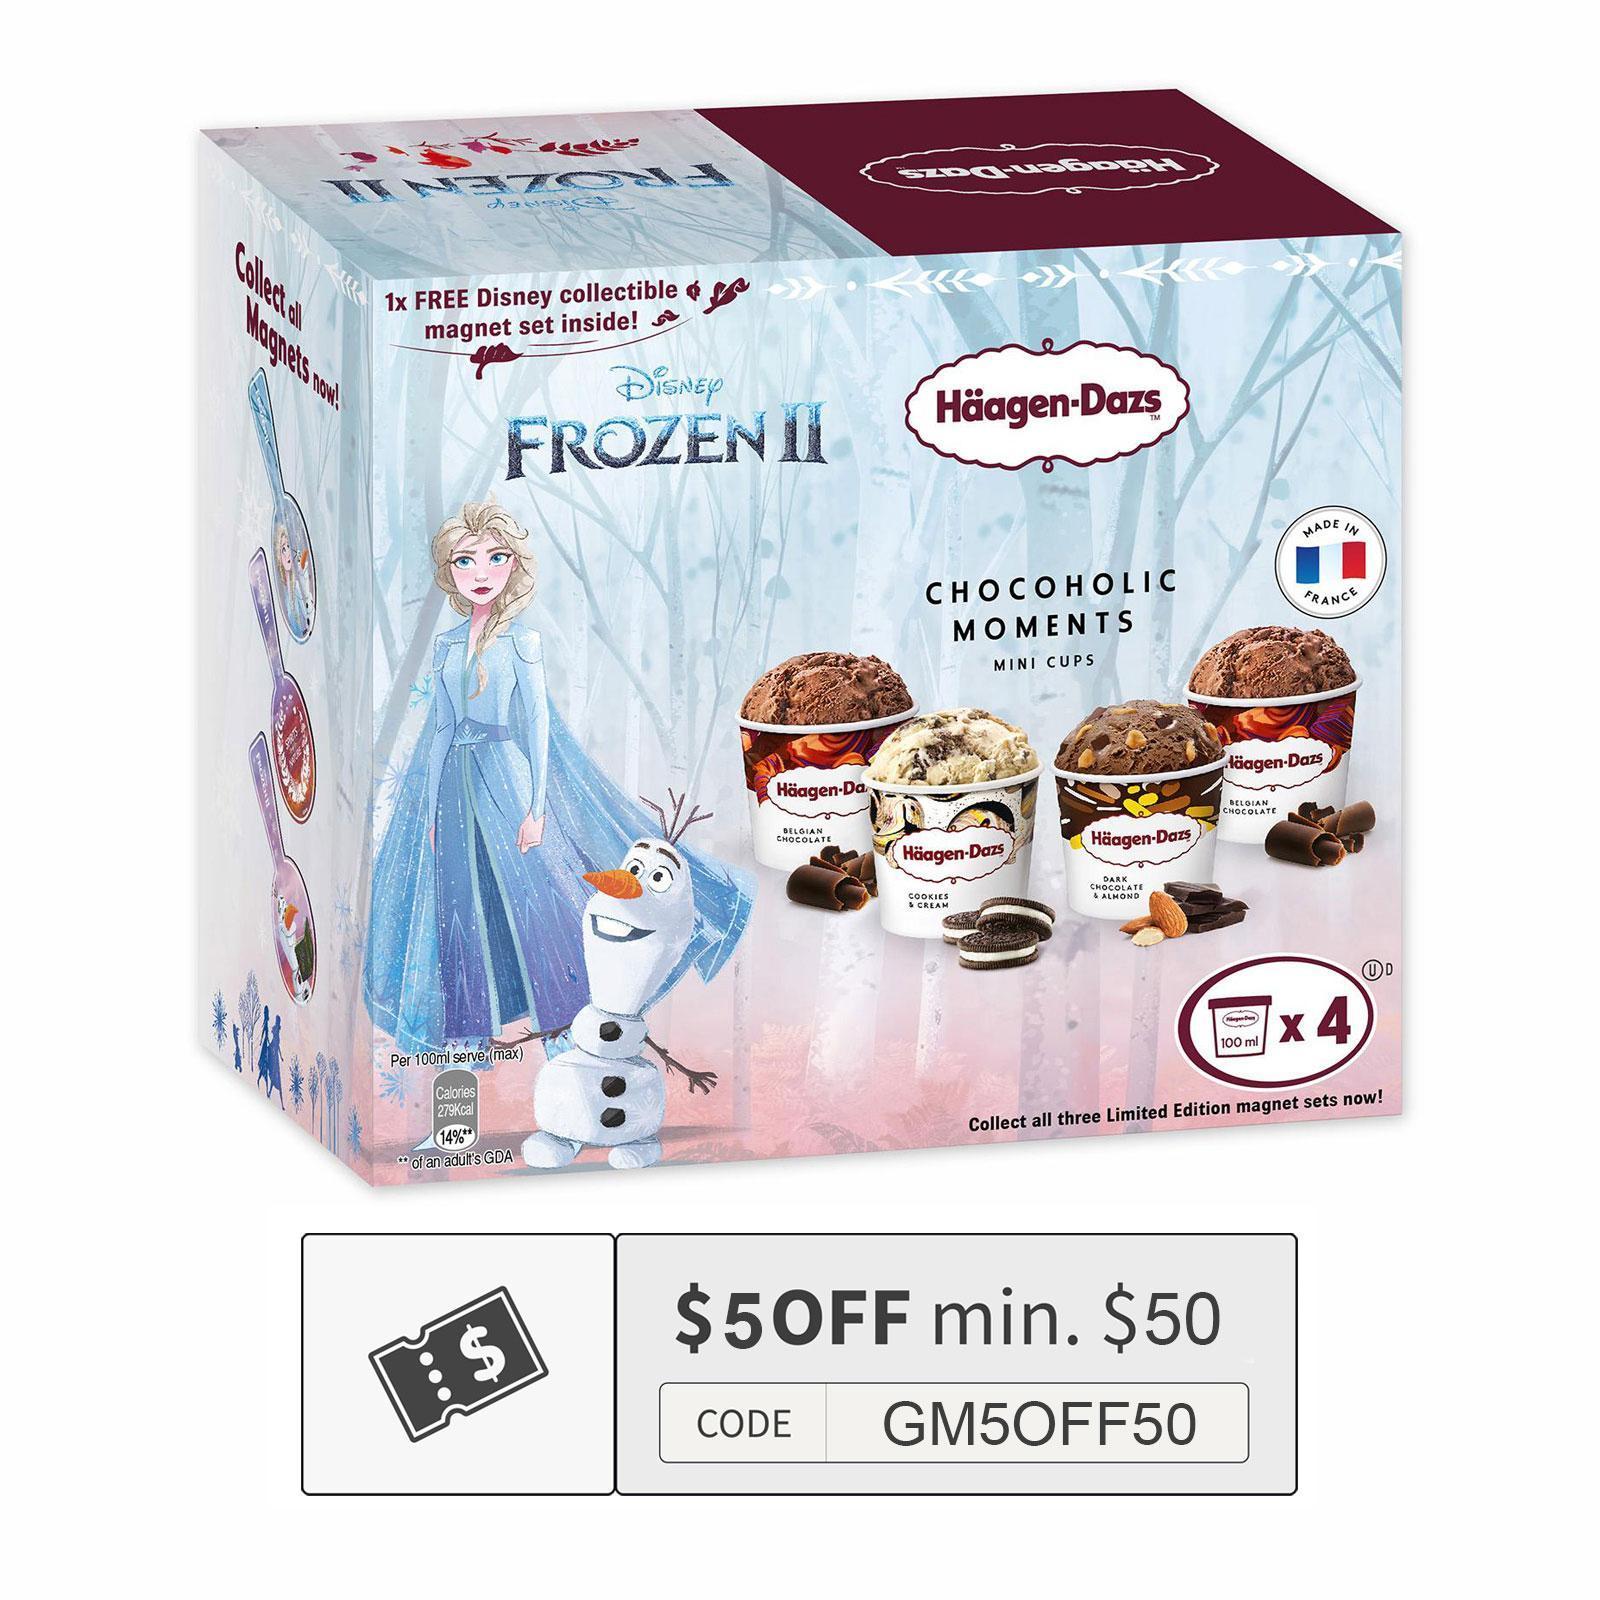 Haagen-Dazs Disney Frozen Chocoholic Moments Ice Cream